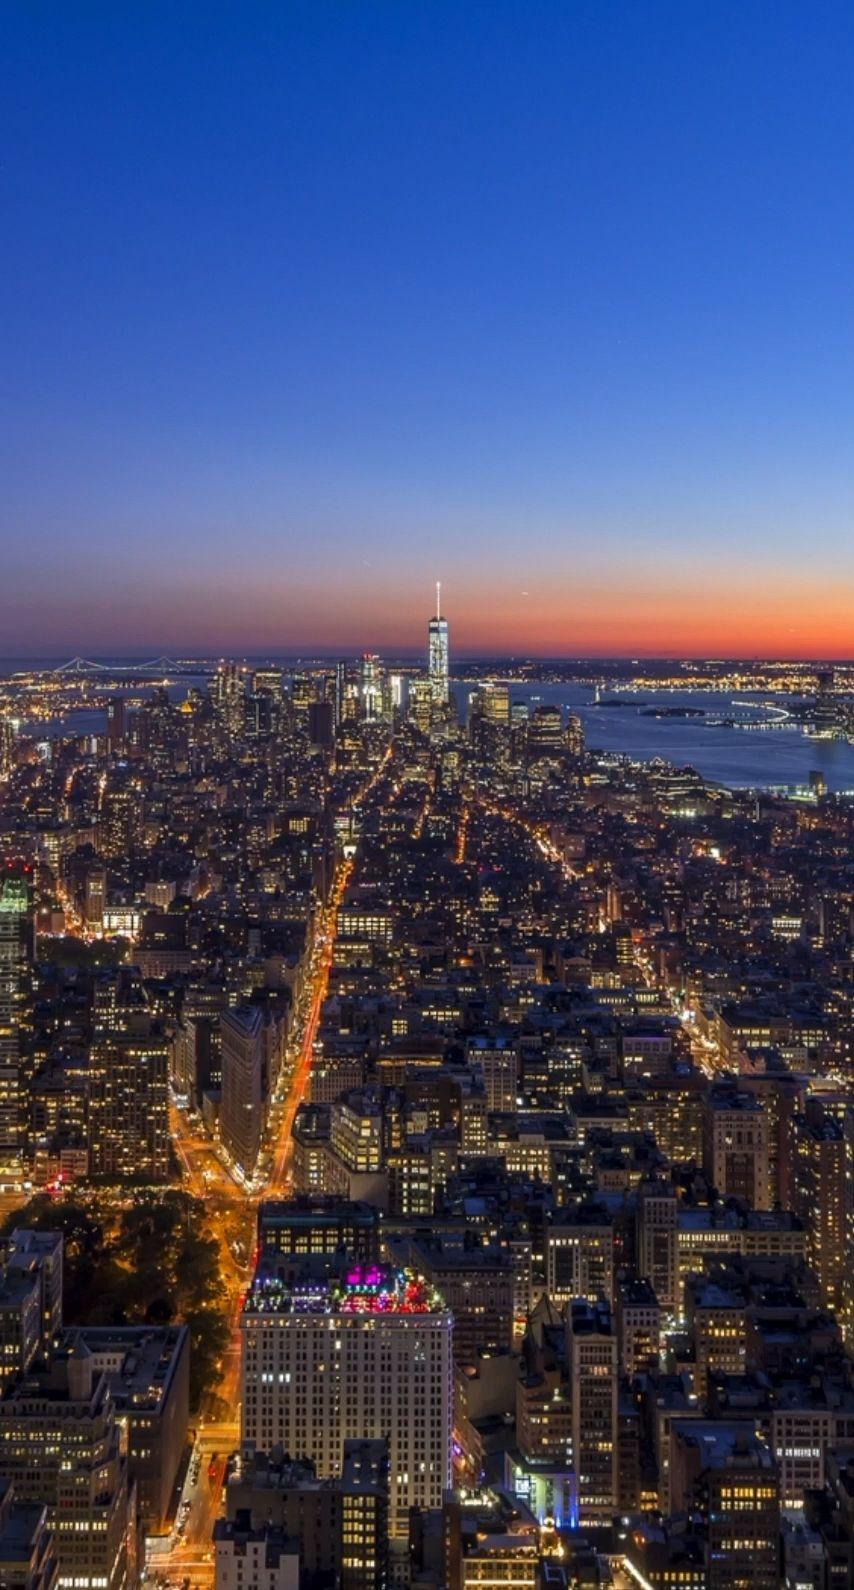 Amazing City Lights Video City Lights Wallpaper City Wallpaper Live Wallpaper Iphone